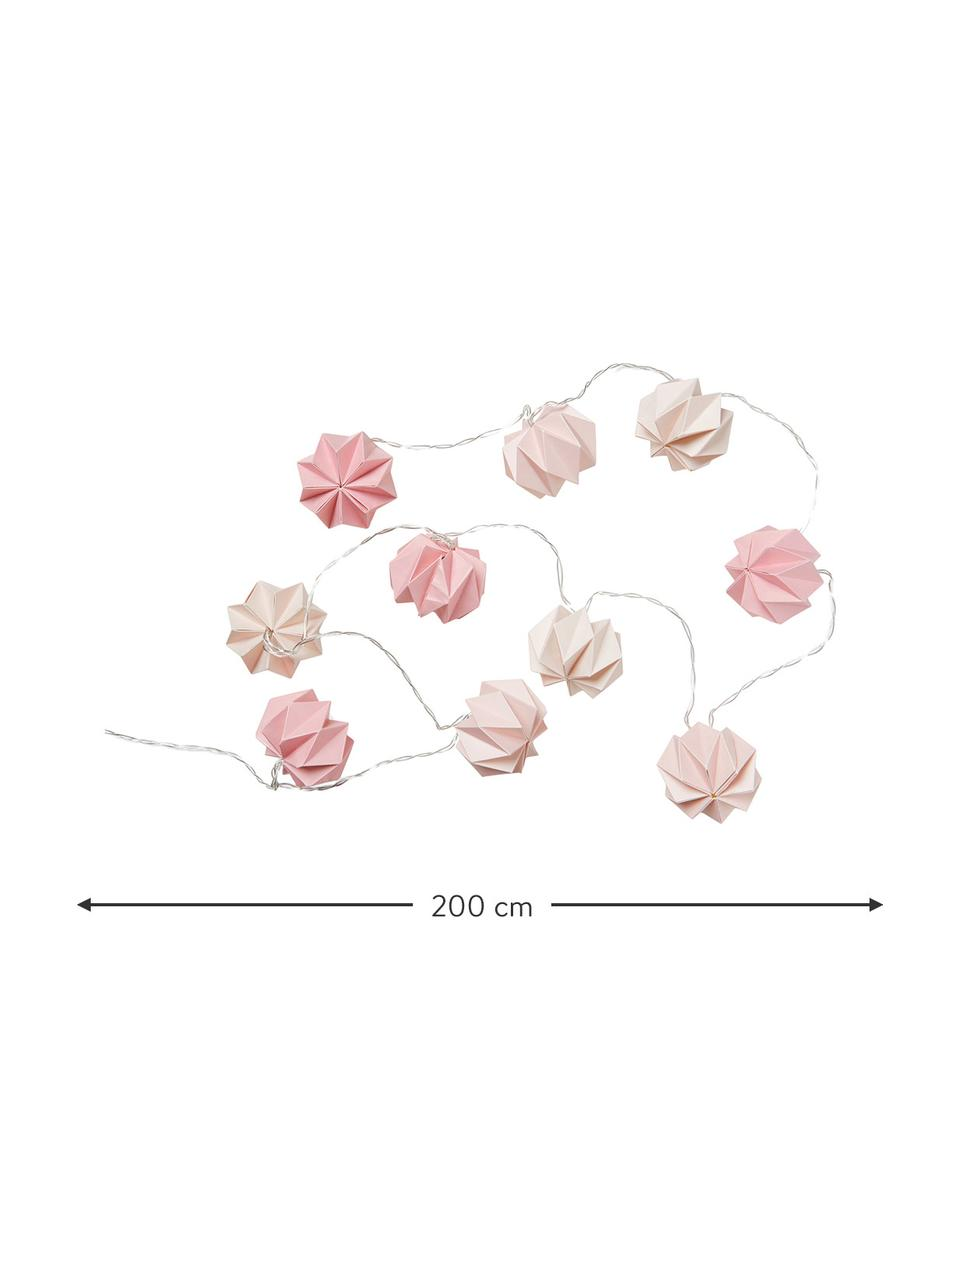 Lichterkette Origami, 200 cm, Papier, Rosatöne, L 200 cm